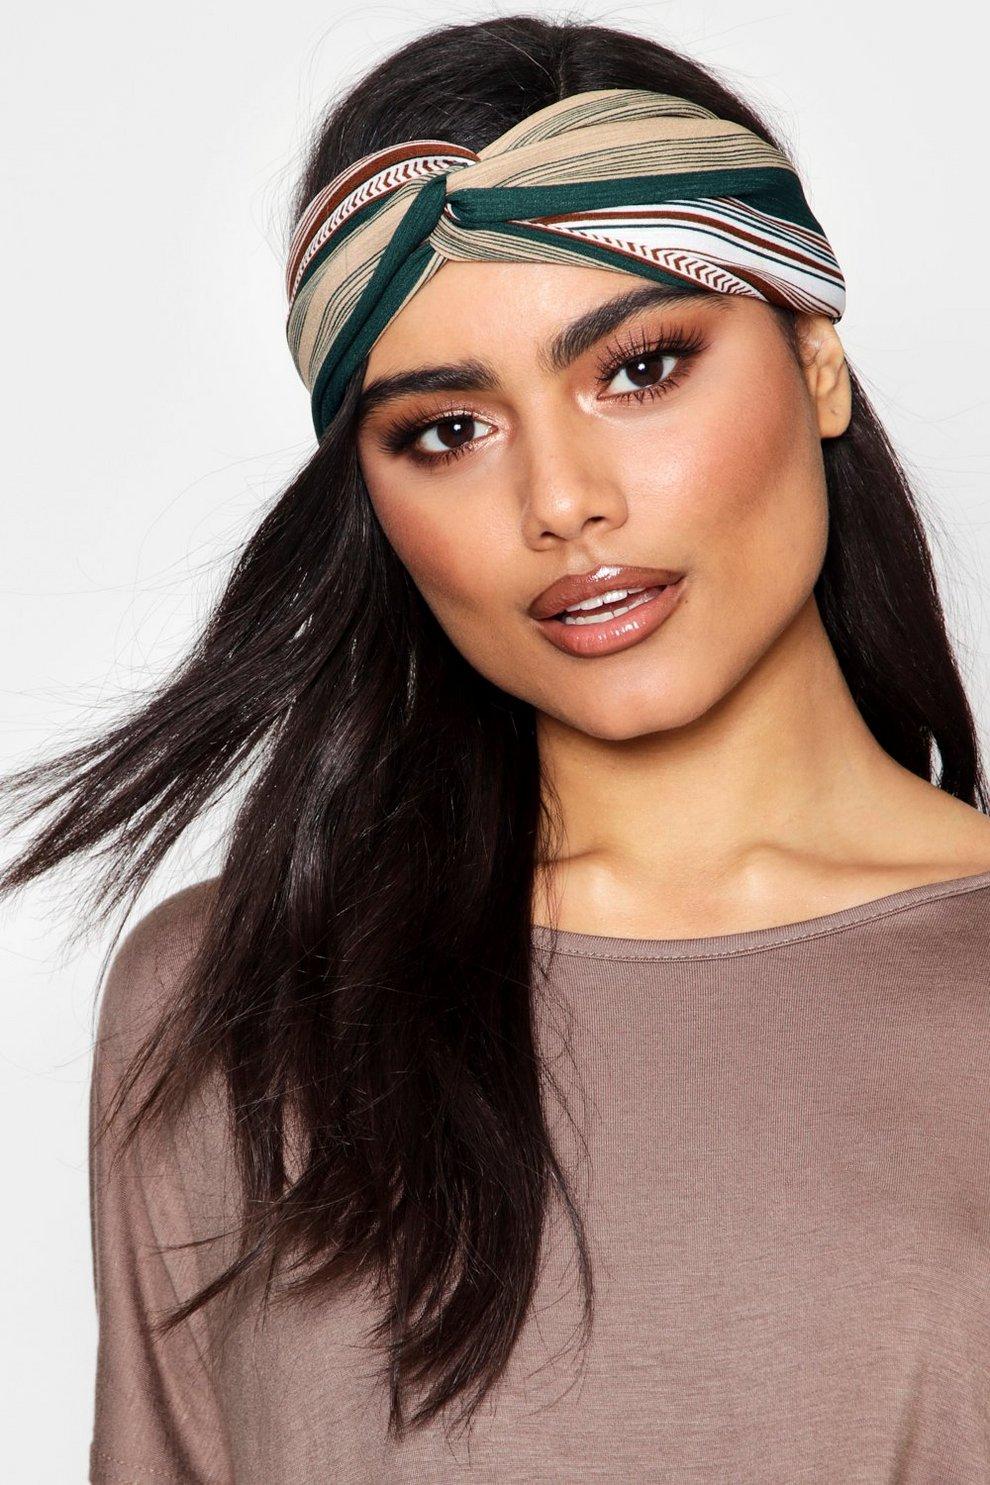 2019 year lifestyle- How to american wear apparel twist headband